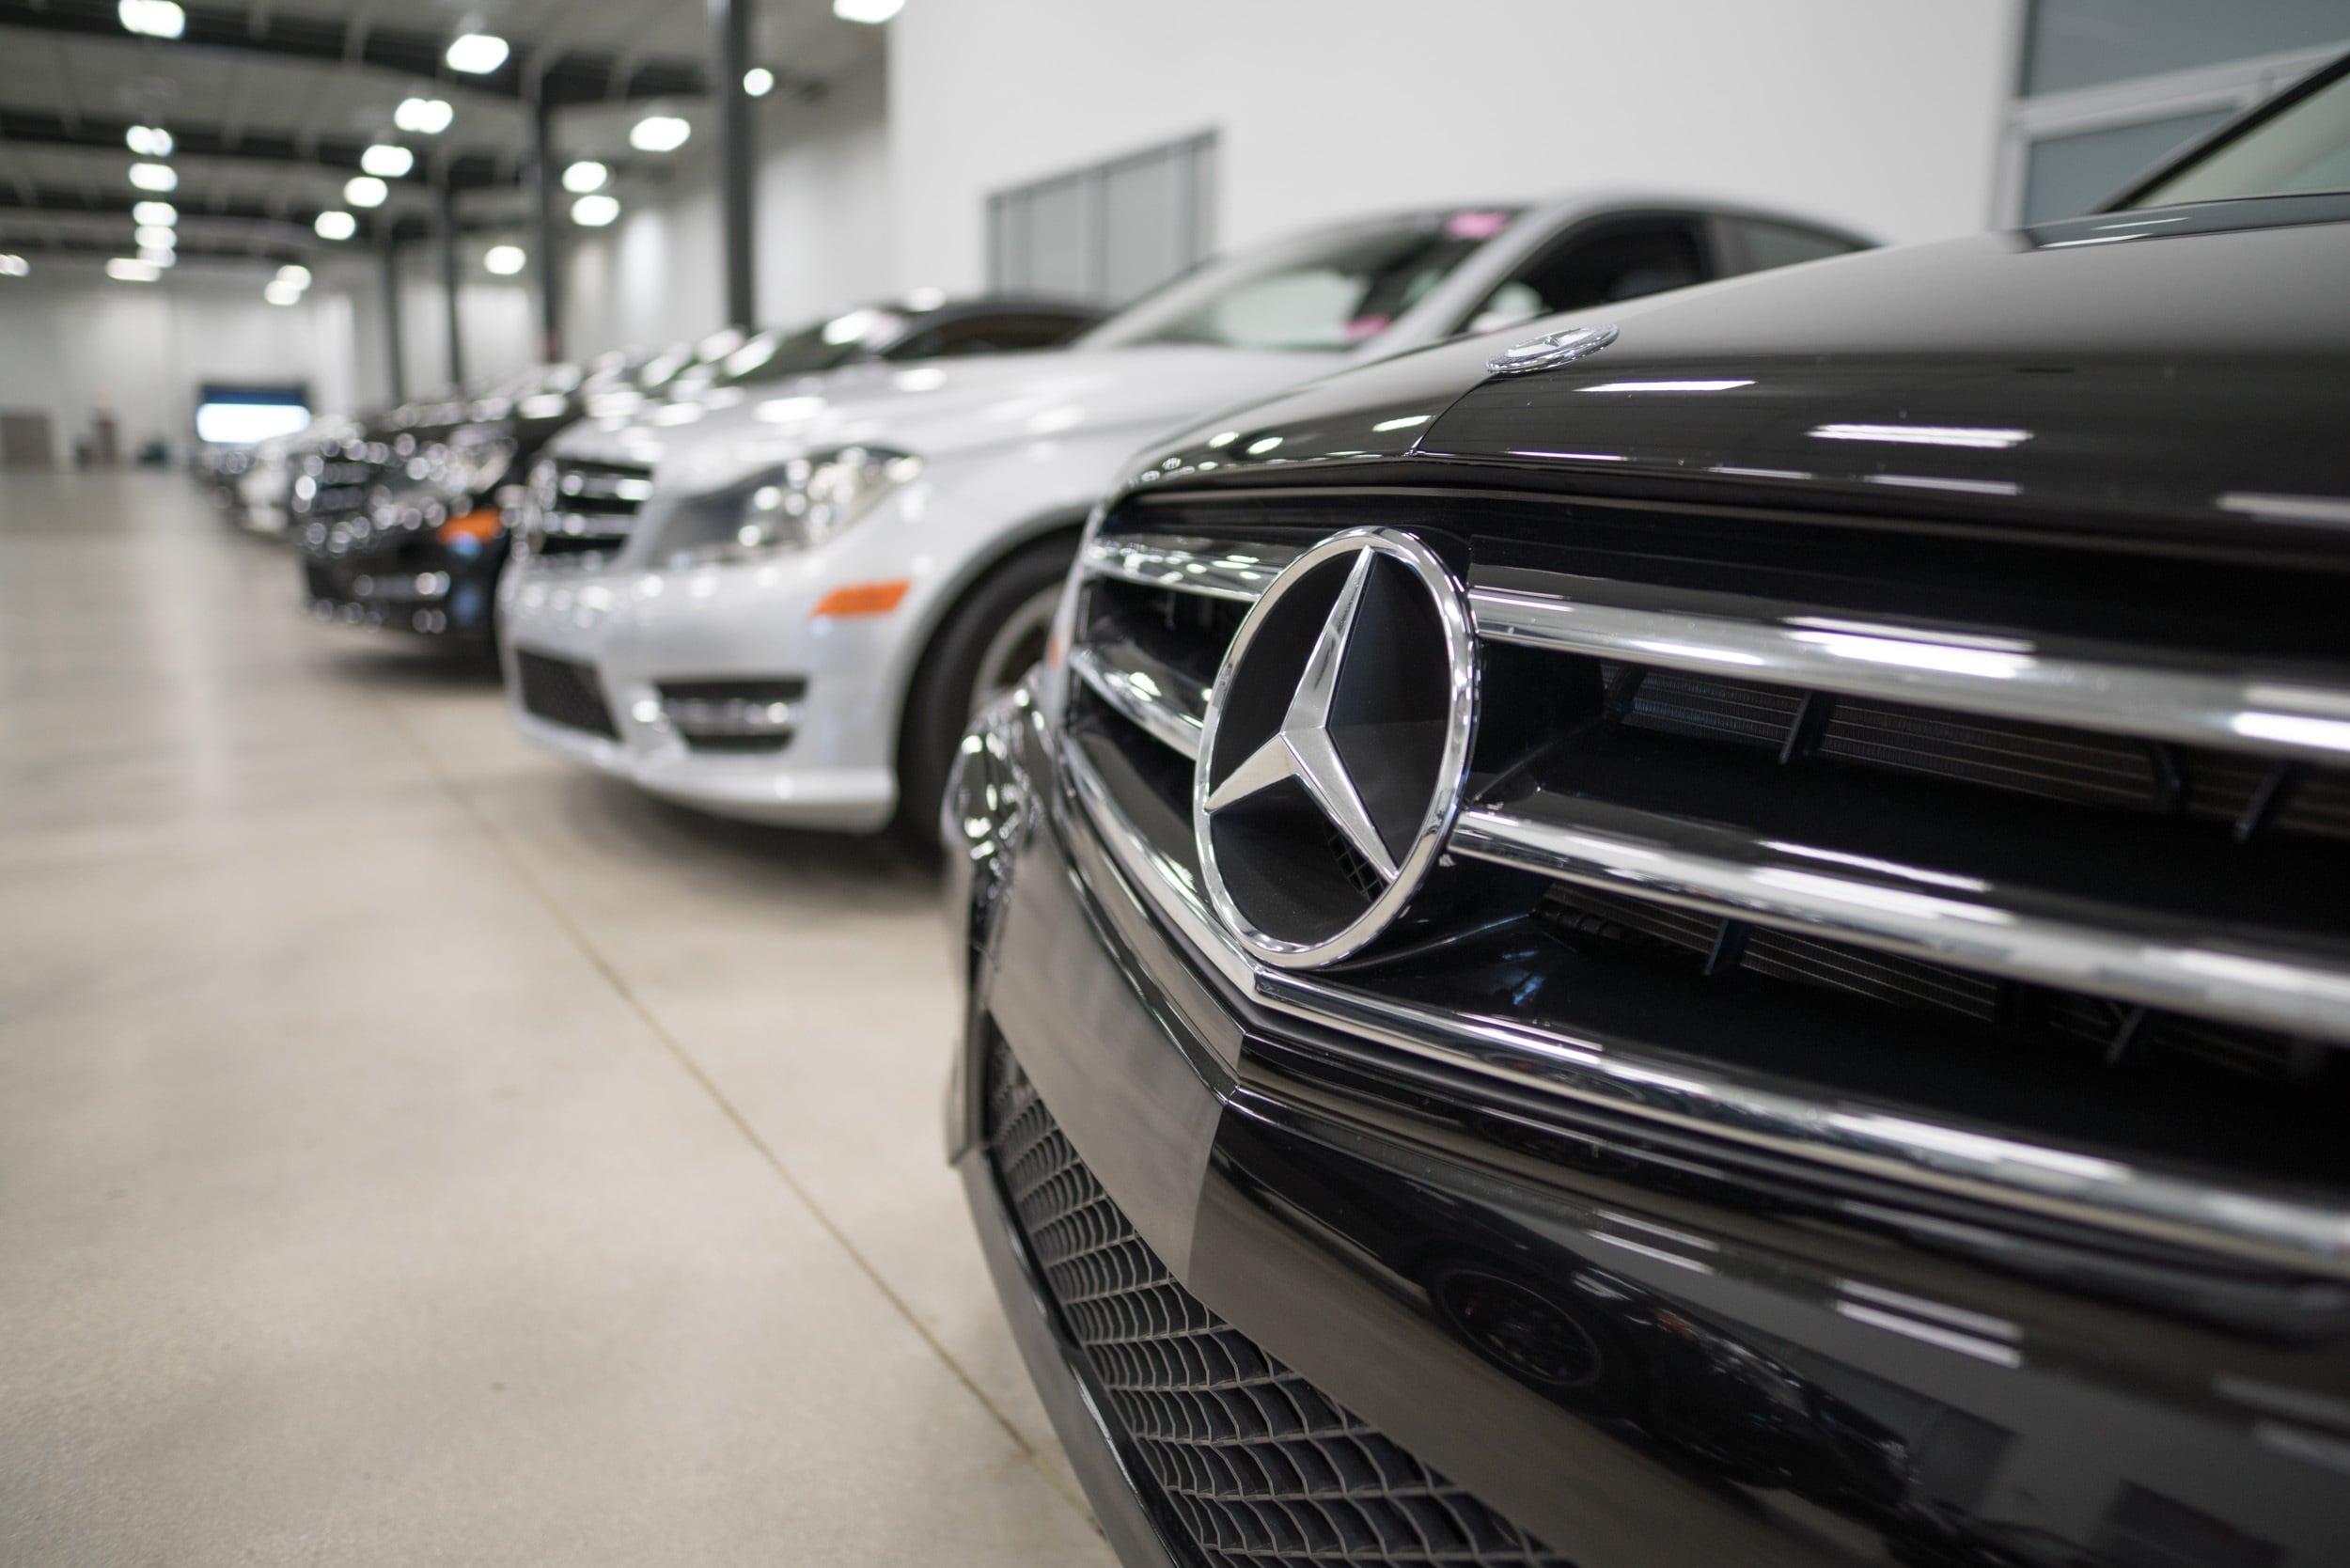 Hunt Valley Mercedes Parts >> Mercedes-Benz of Hunt Valley | Mercedes-Benz Dealer Near Me Baltimore, MD